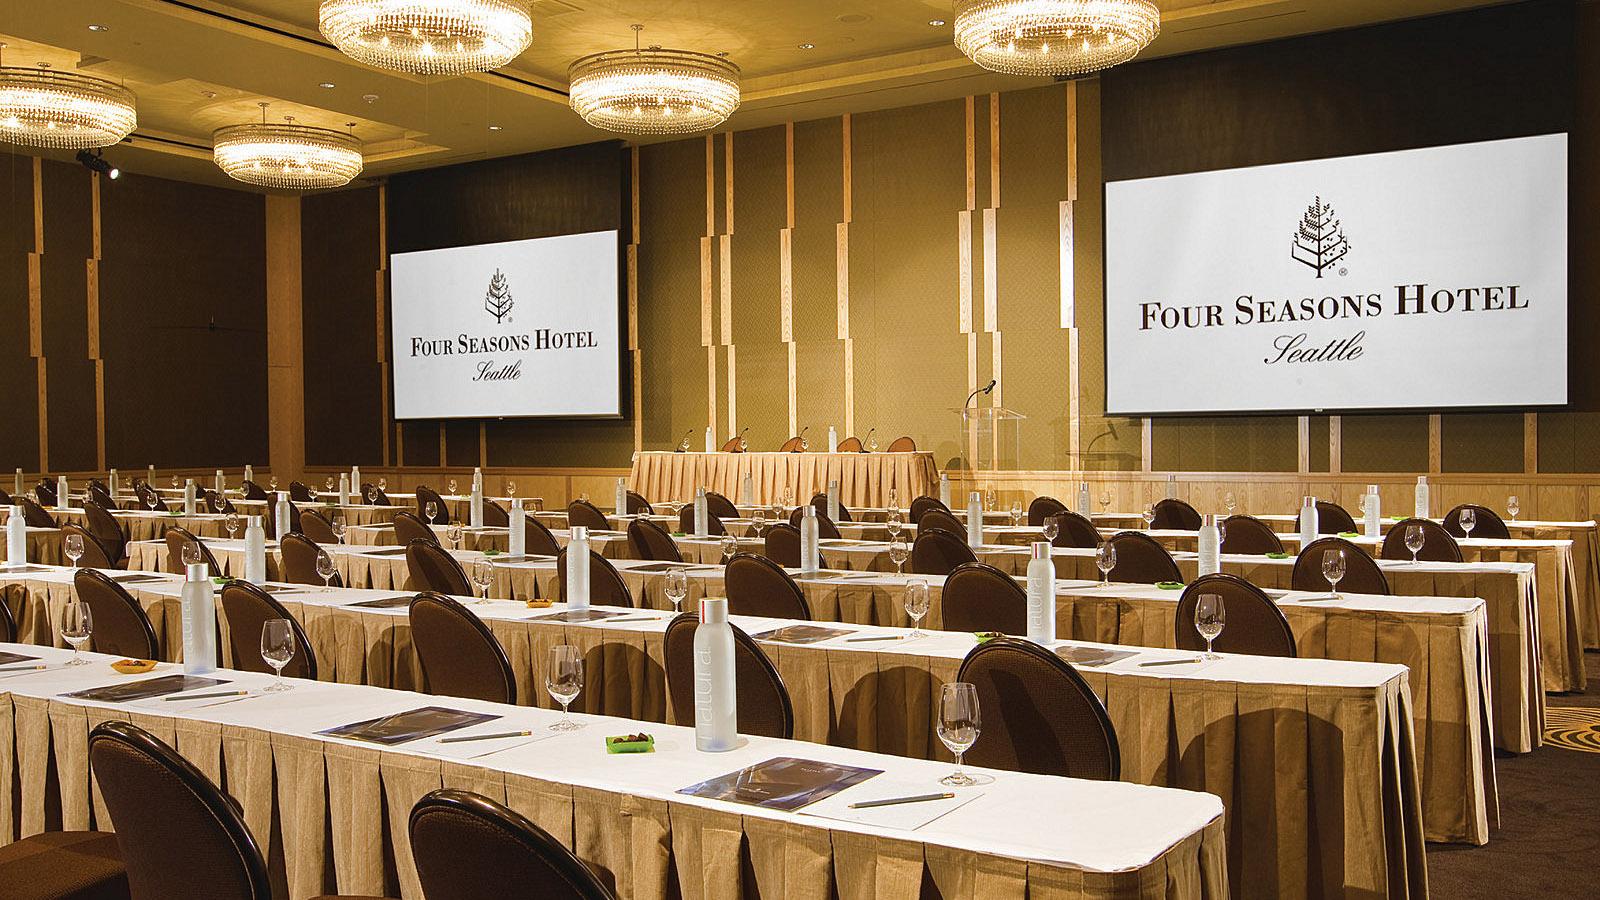 Four Seasons Hotel Meeting Rooms